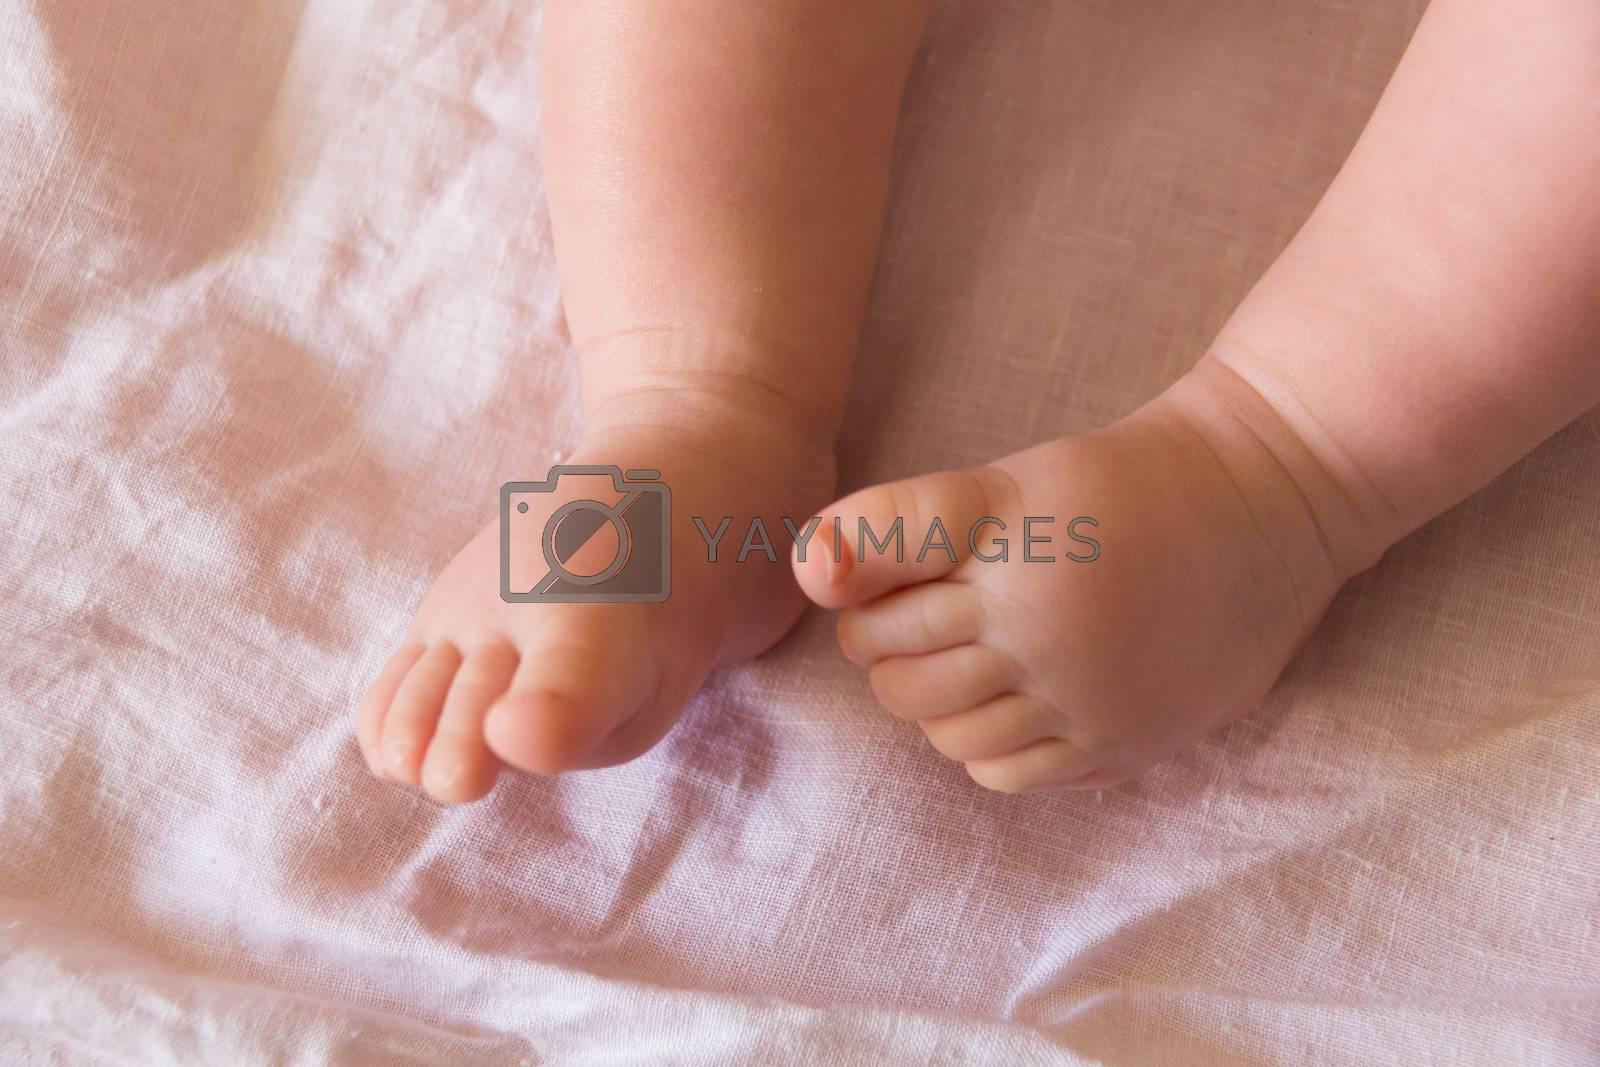 Feet of newborn baby